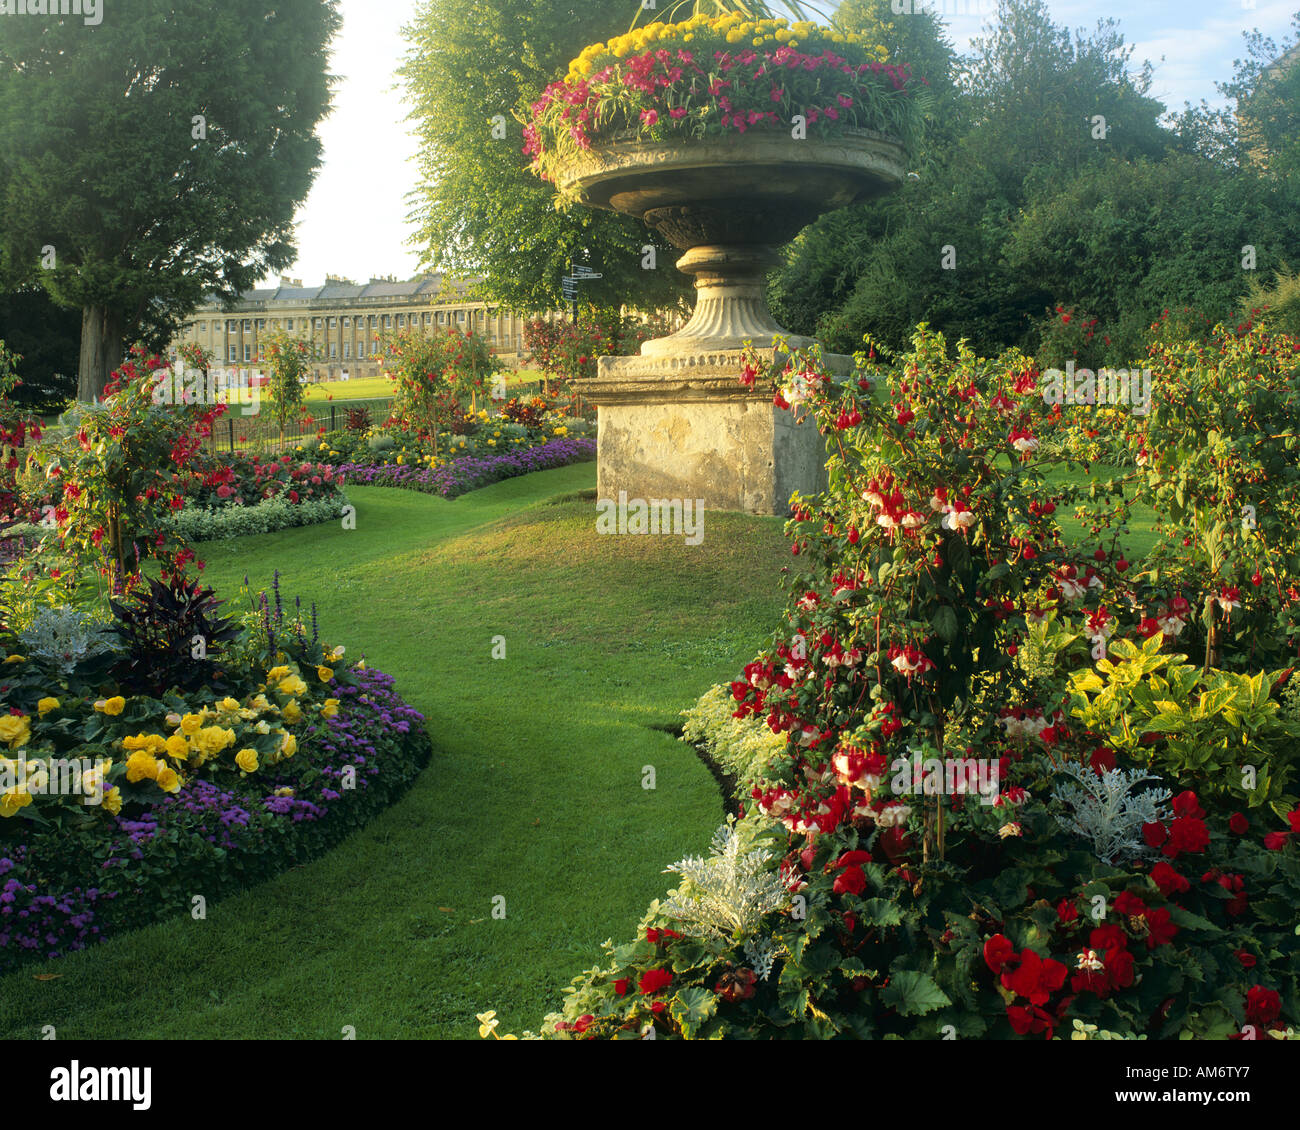 GB - SOMERSET: Royal Crescent in die Stadt Bath Stockbild